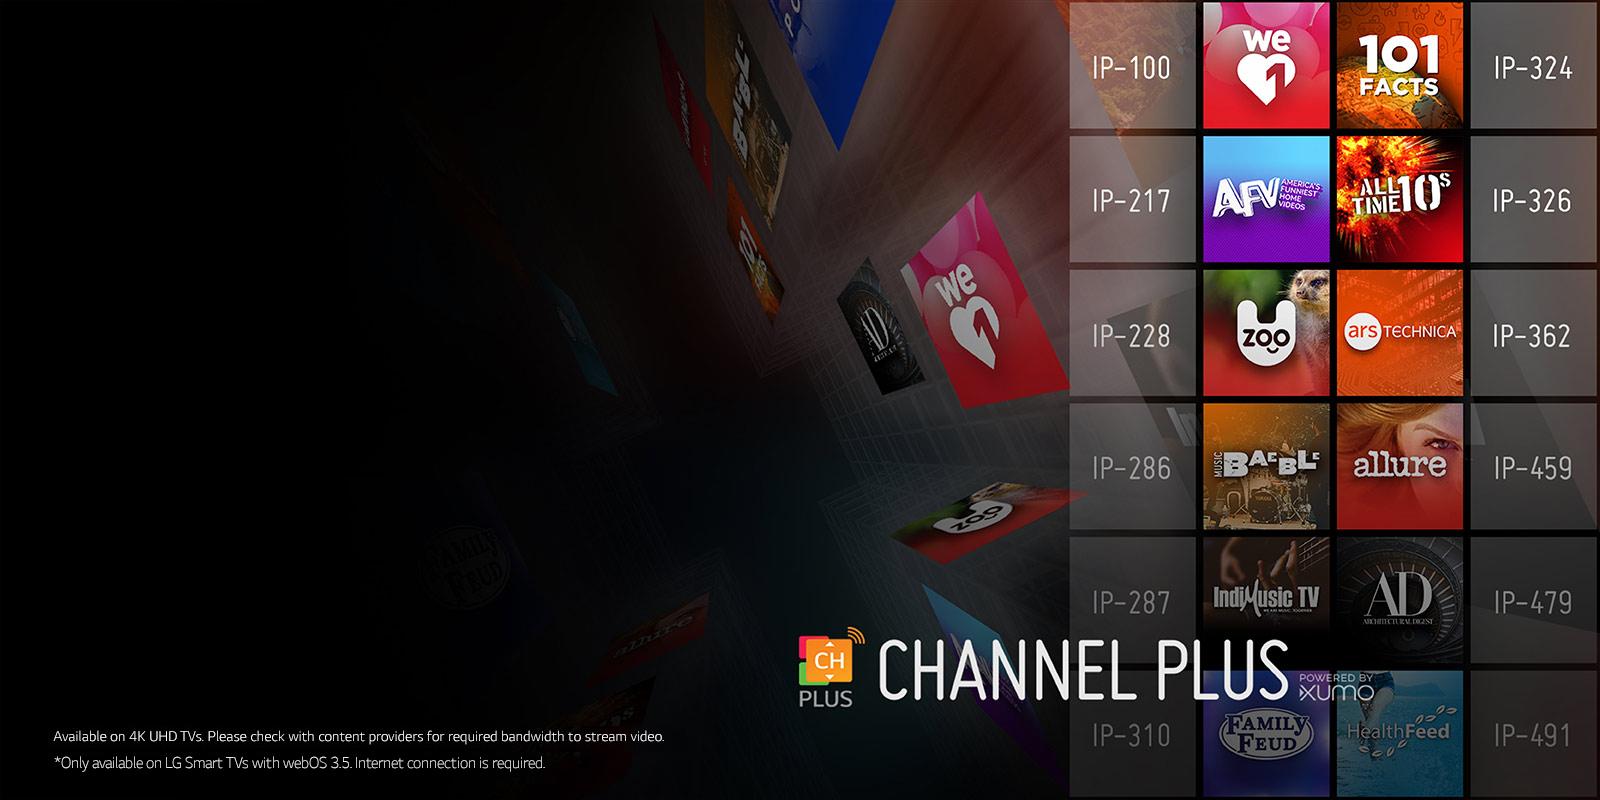 lg 65uj6540. channel plus lg 65uj6540